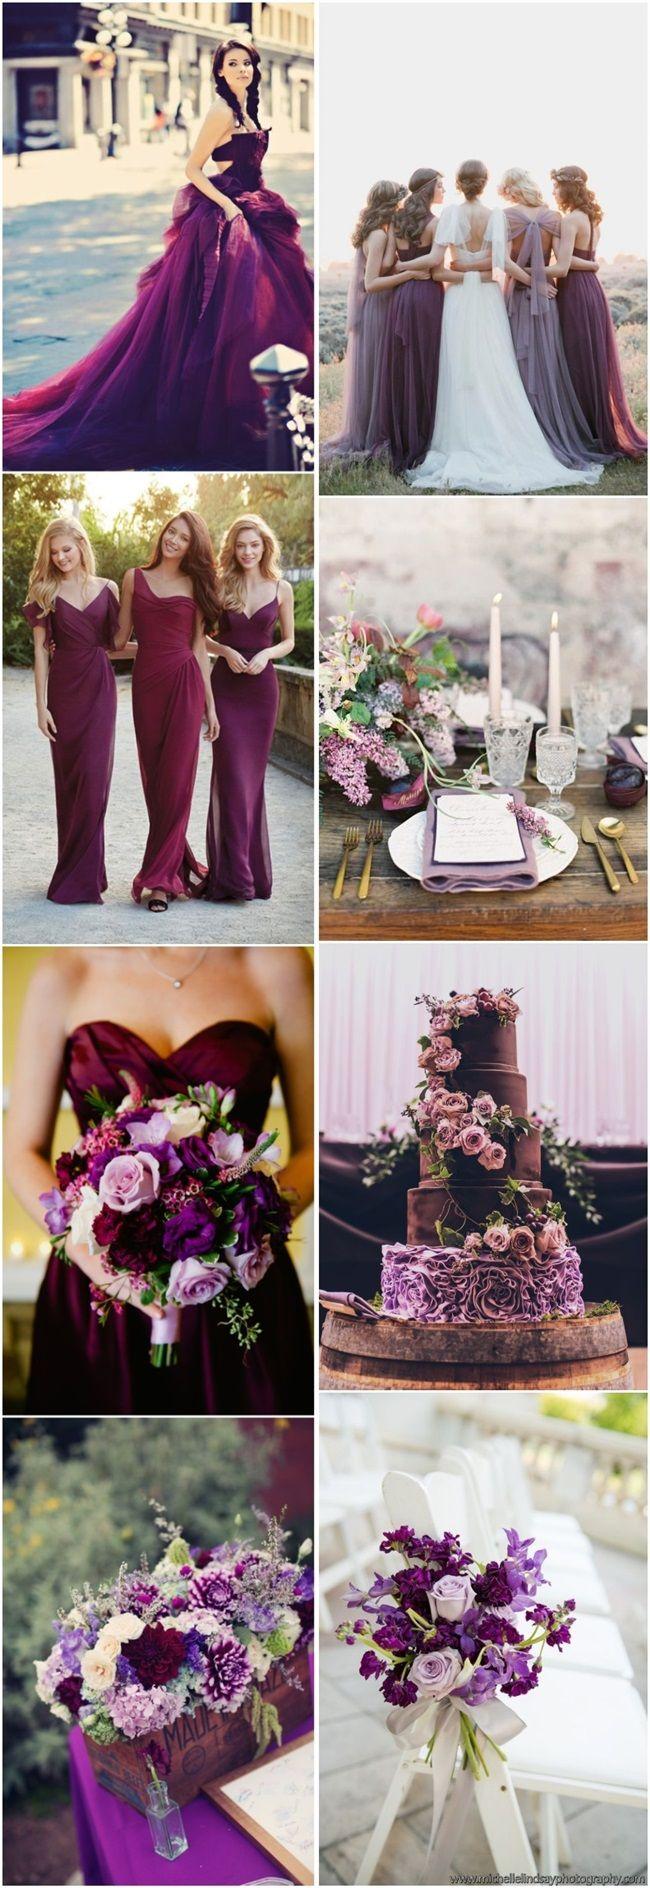 Lavender themed wedding decor   best wedding images on Pinterest  Wedding ideas Wedding